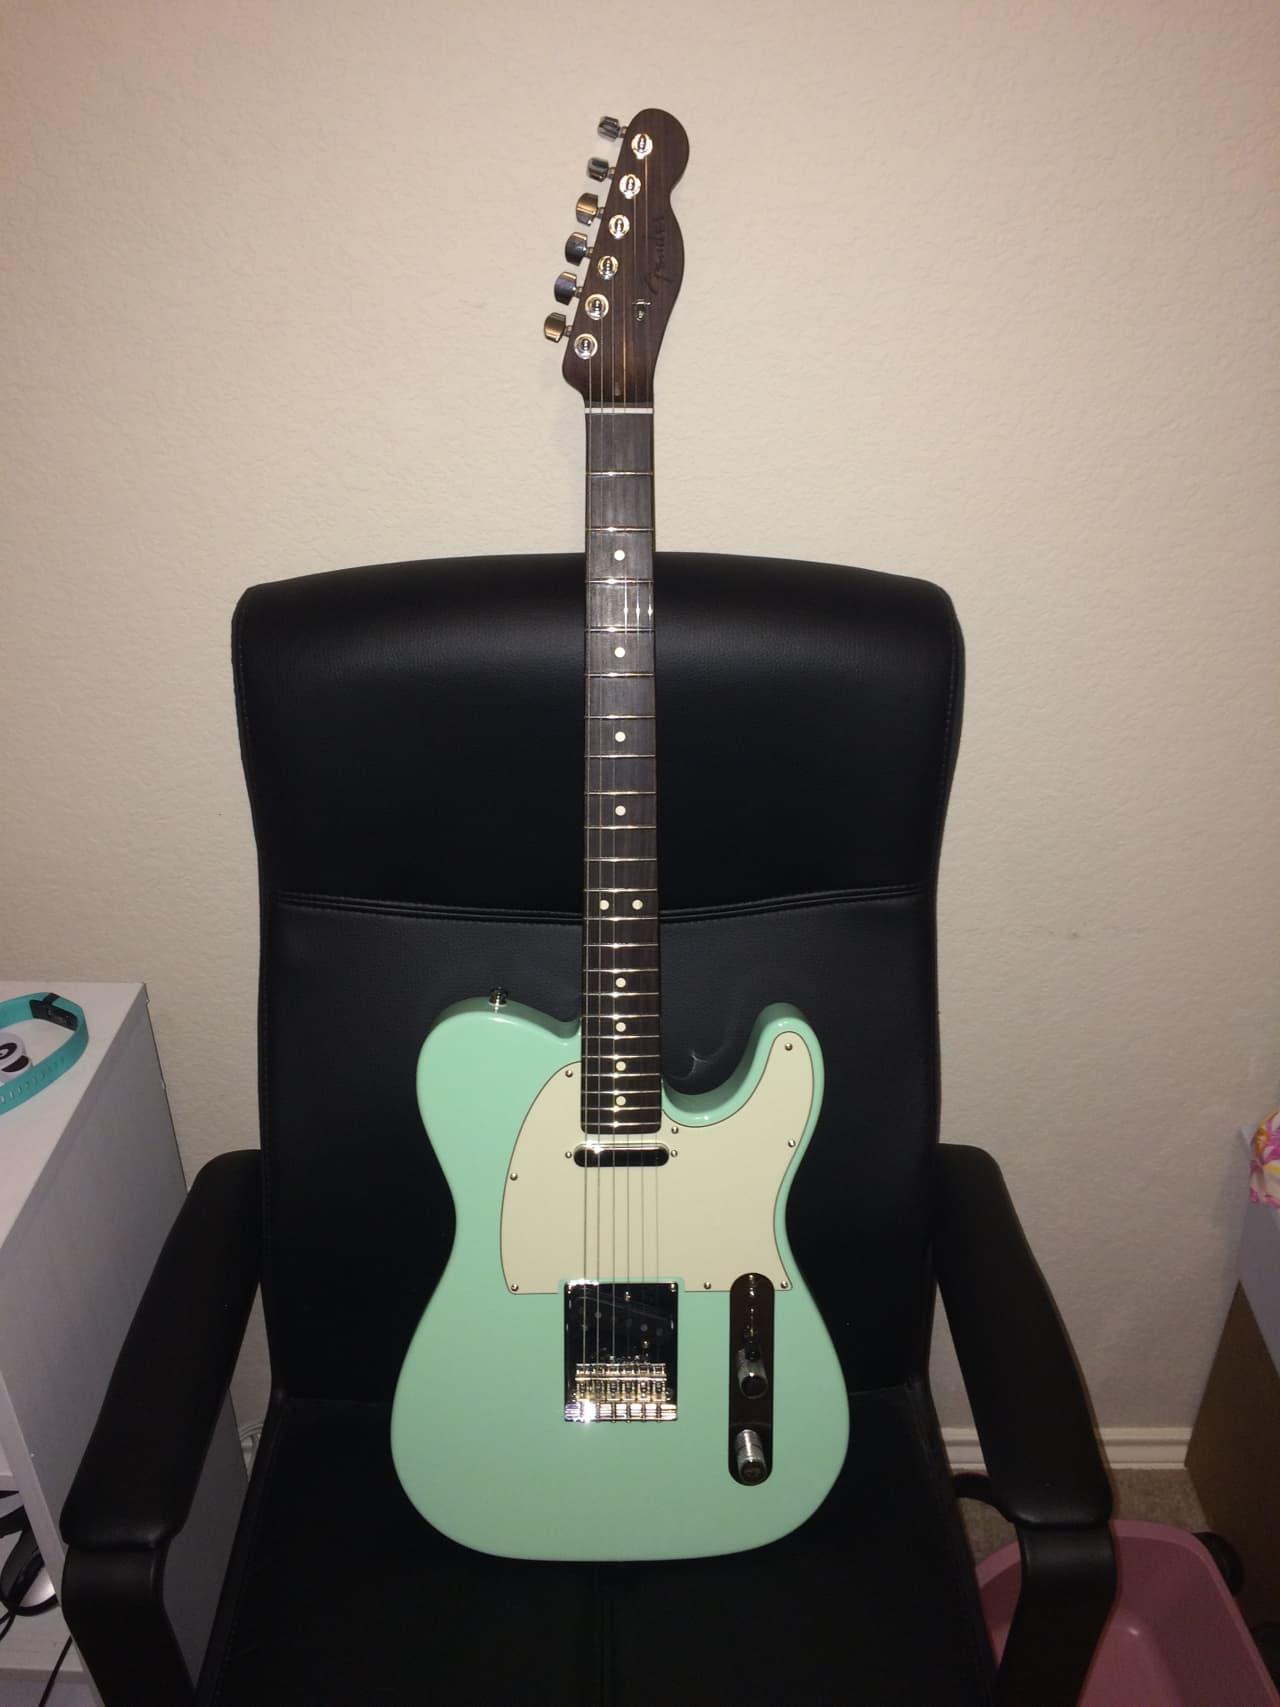 Fender Guitar Strap >> Fender Limited Edition American Standard Telecaster ...